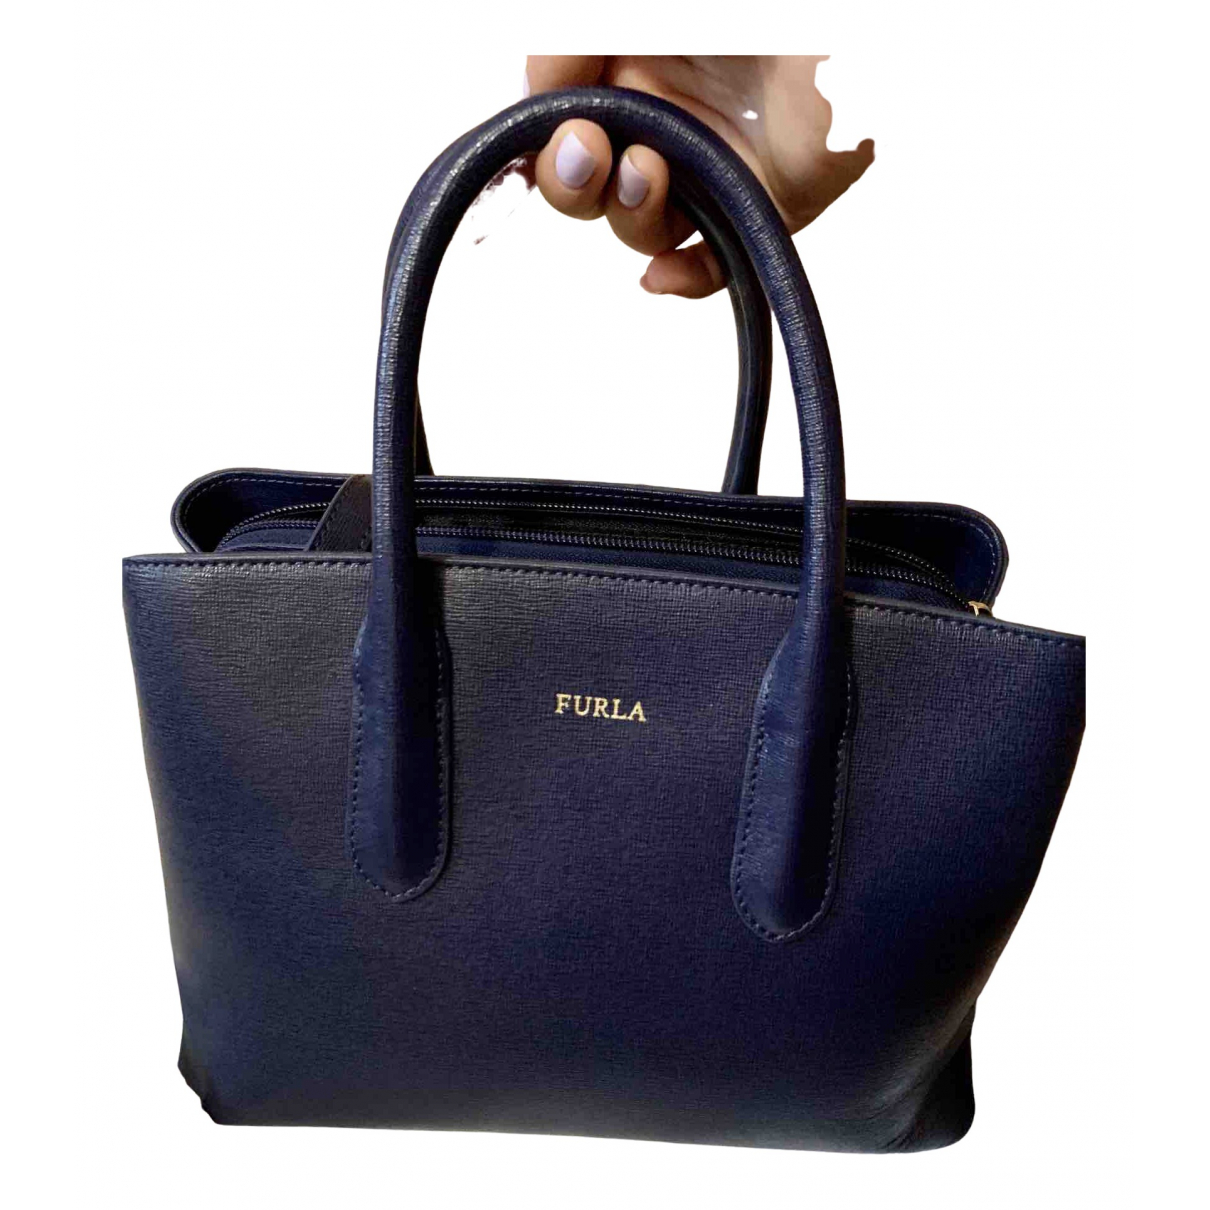 Furla \N Blue Leather handbag for Women \N